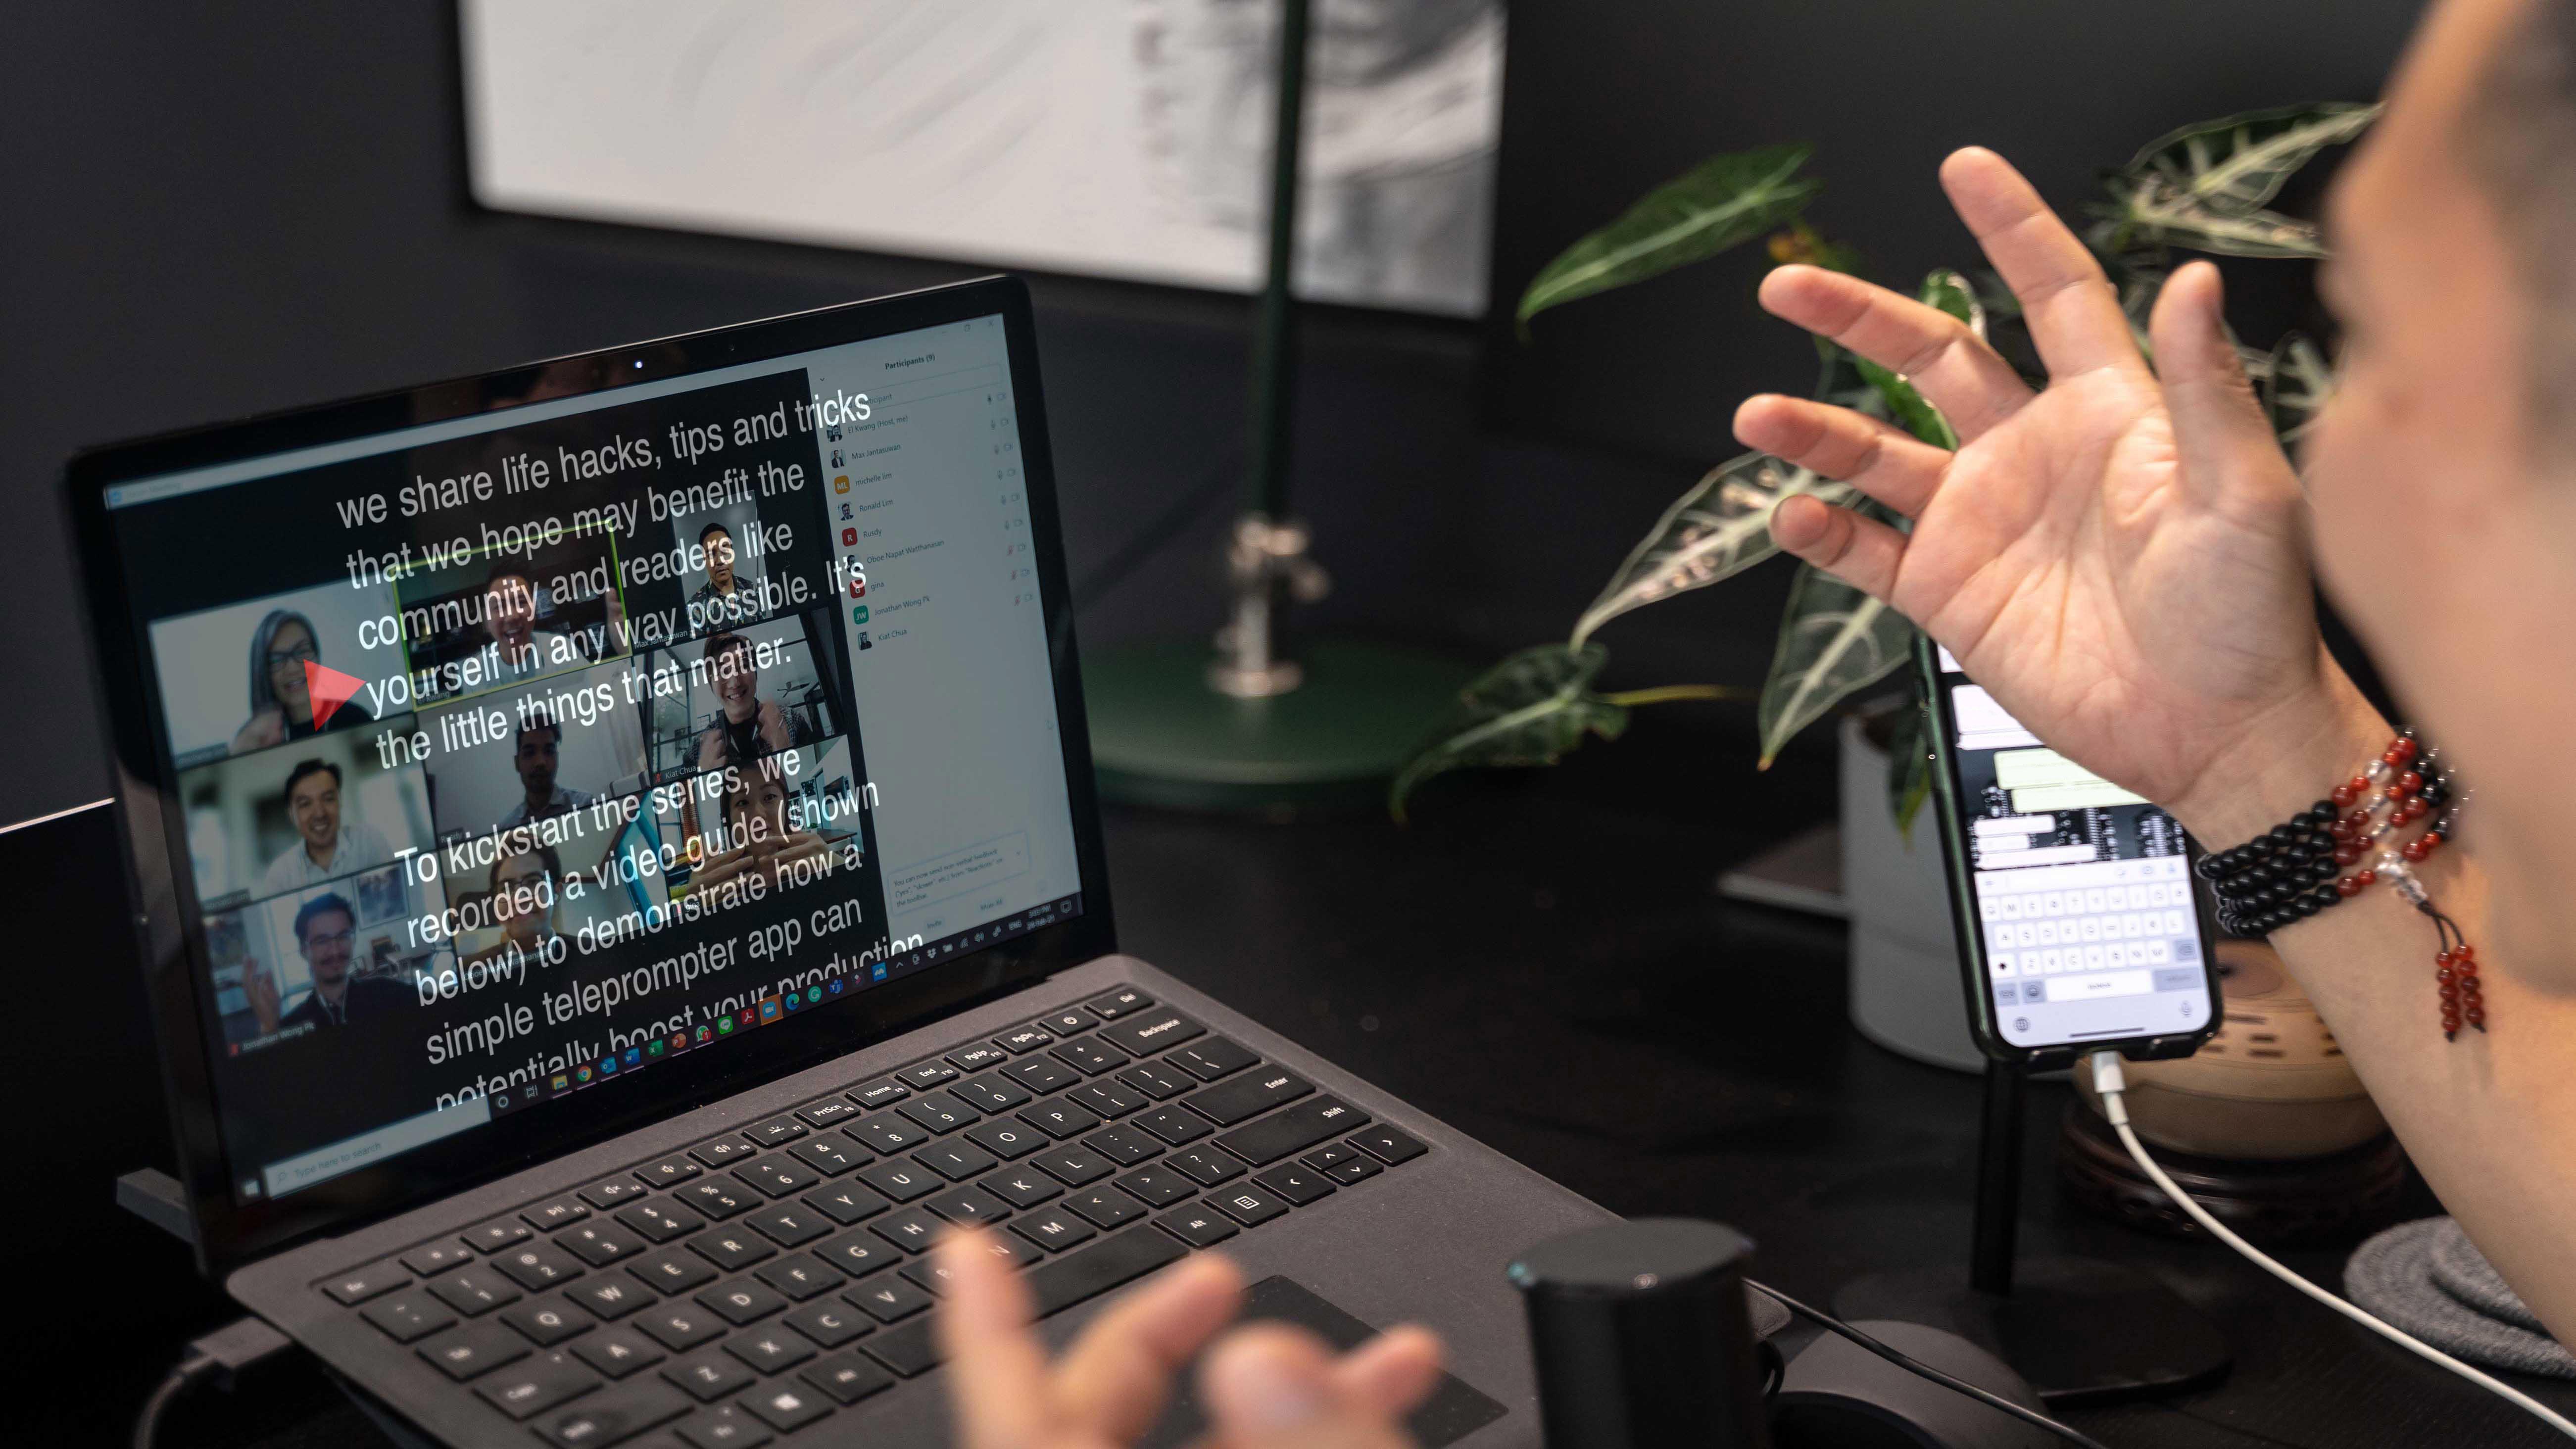 I WISH I KNEW: Presentation hacks